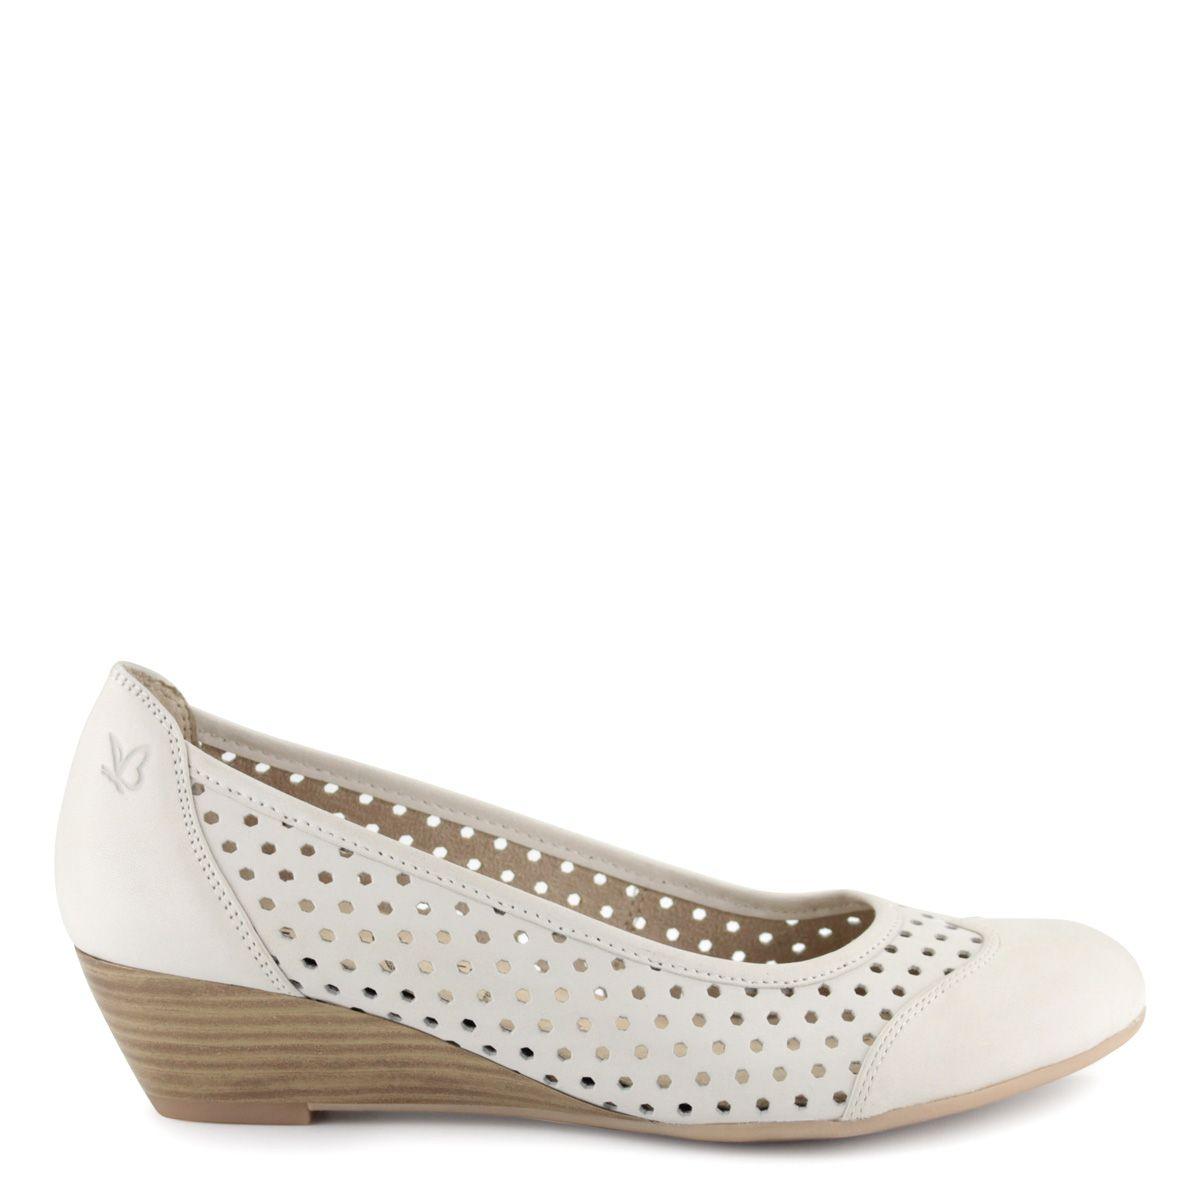 Törtfehér éktalpas Caprice cipő  c3b5f46863